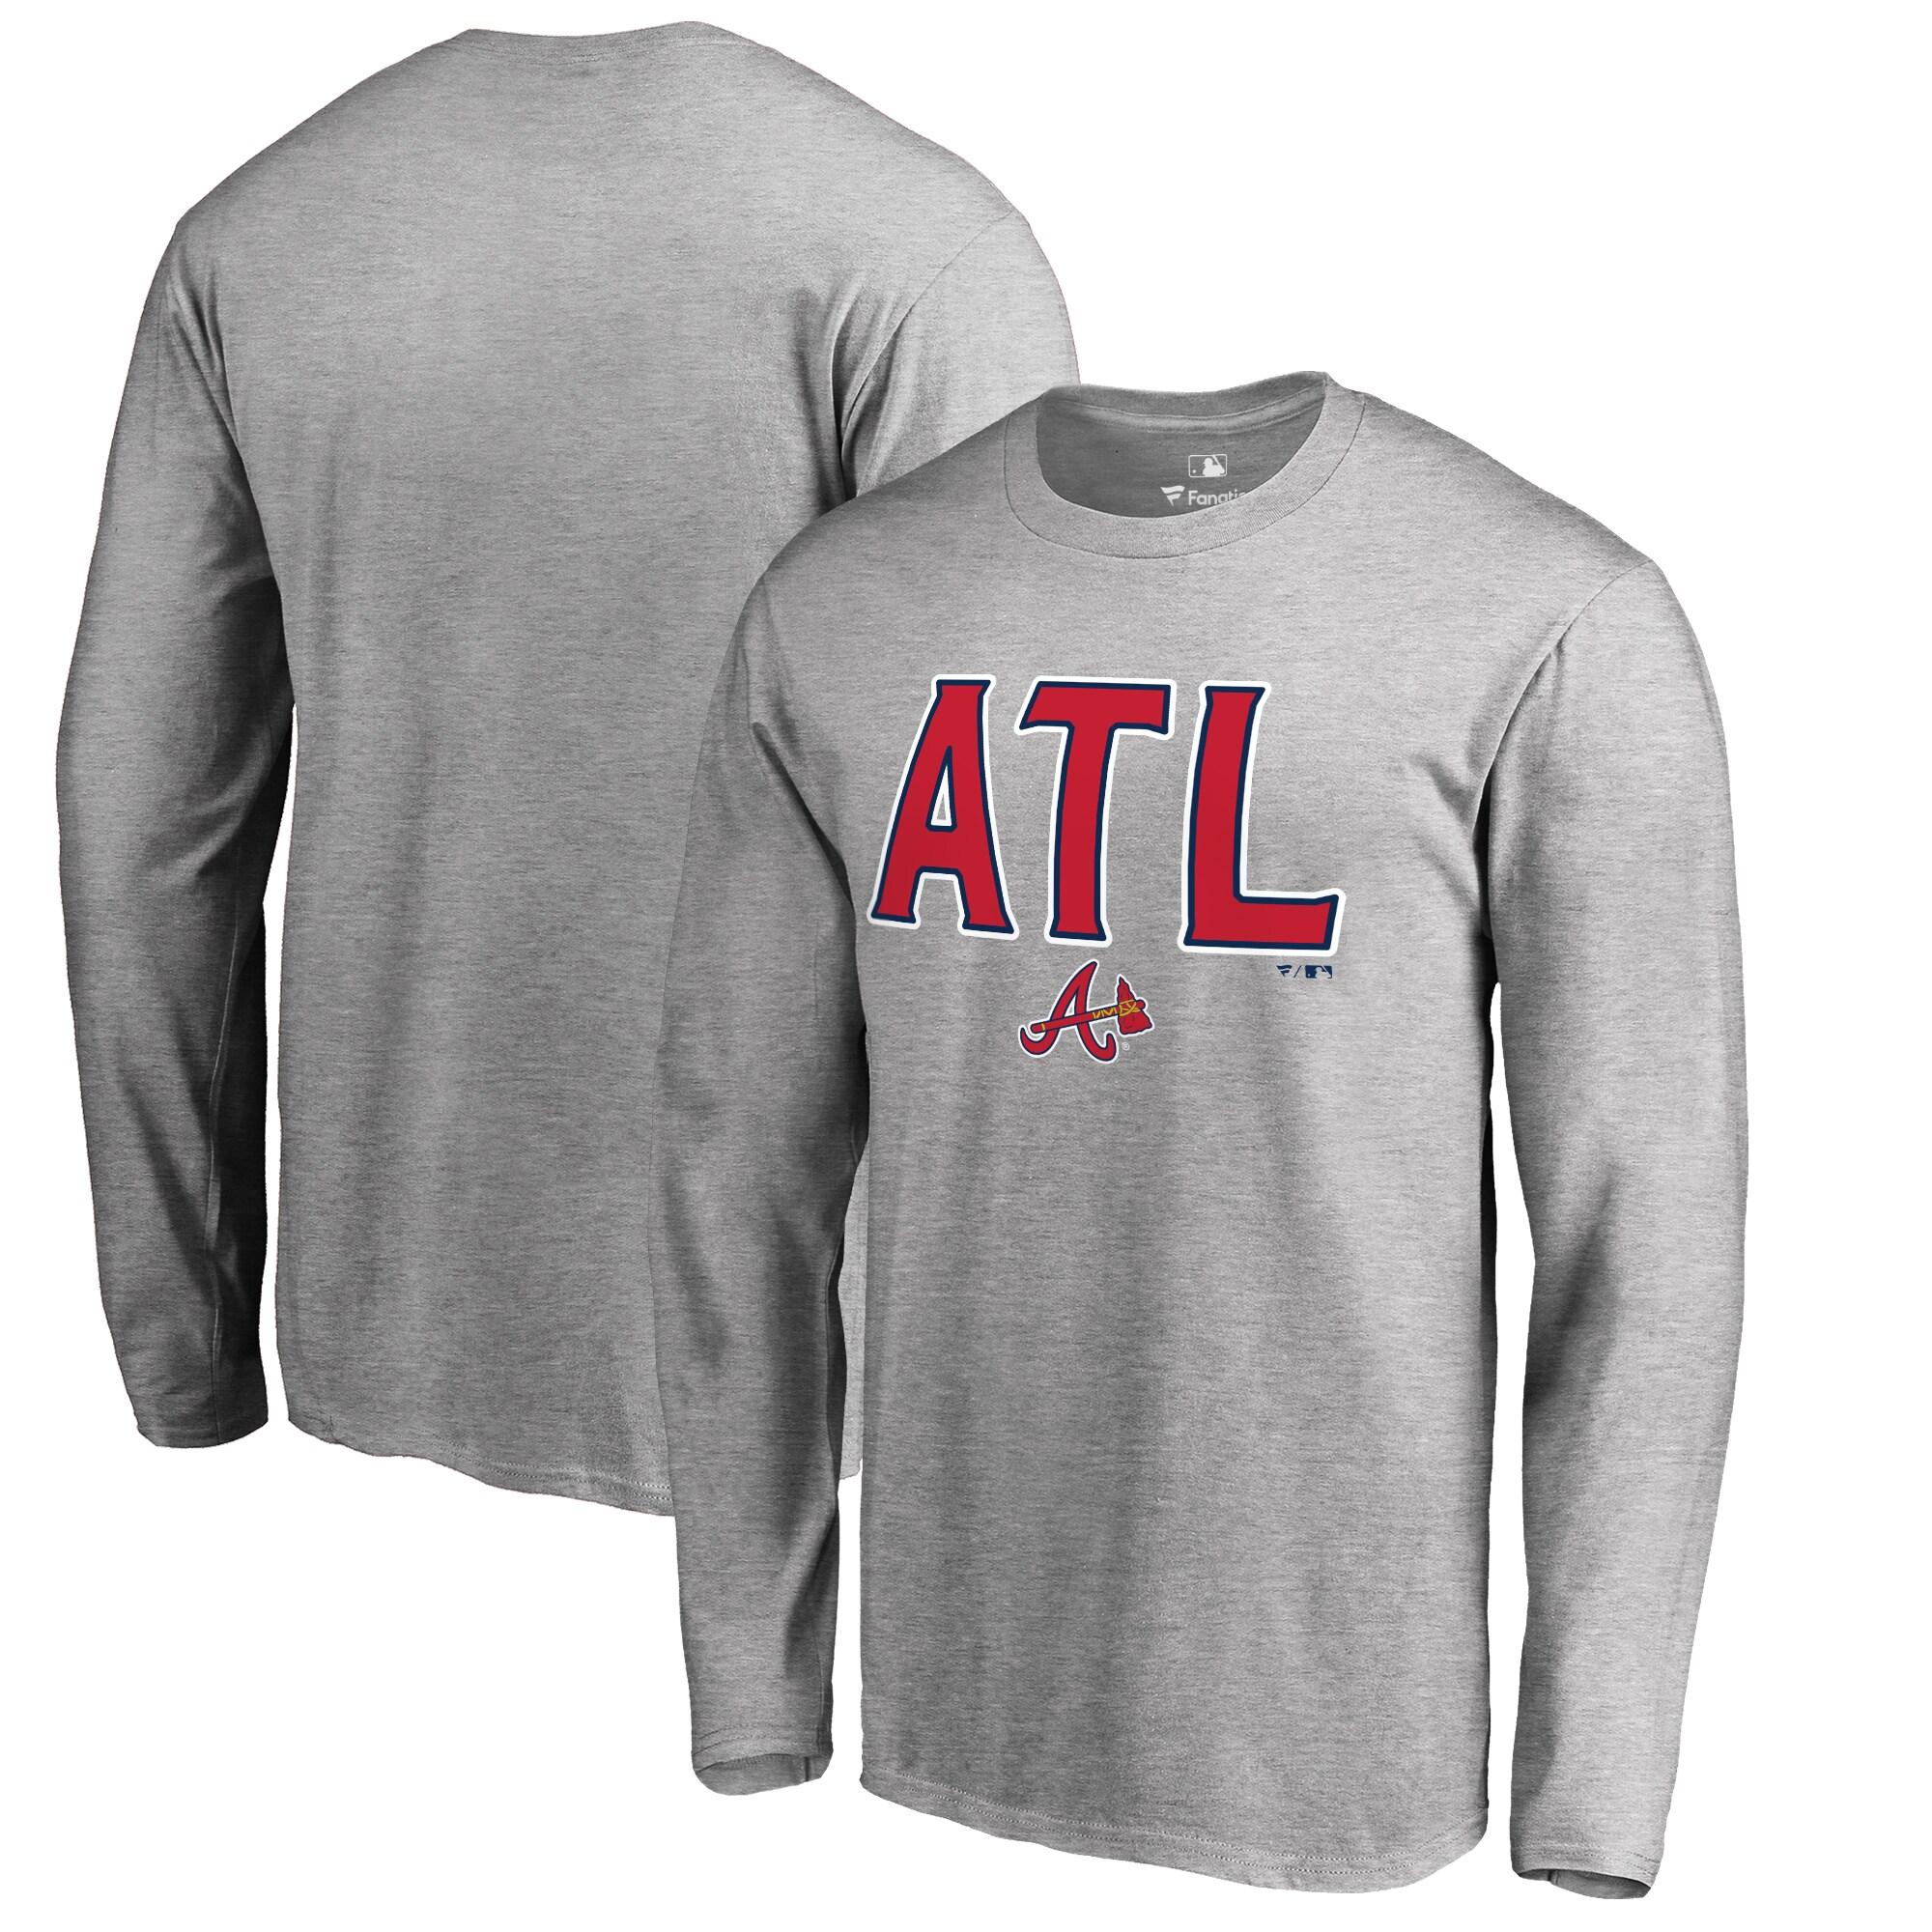 Atlanta Braves ATL Hometown Long Sleeve T-Shirt - Ash